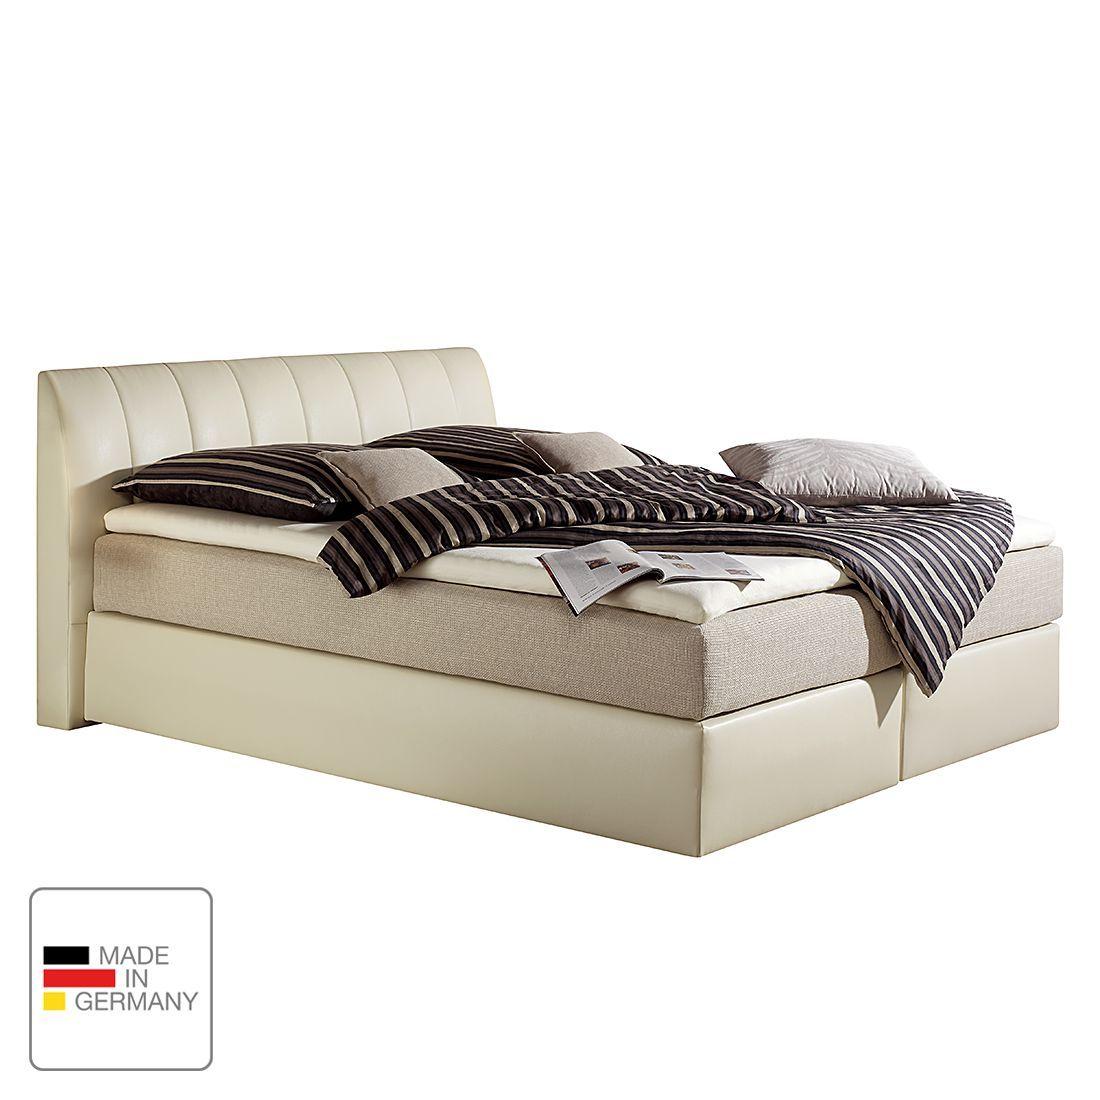 Campaign Furniture Kampagne Futonbett Selber Bauen Bauanleitung